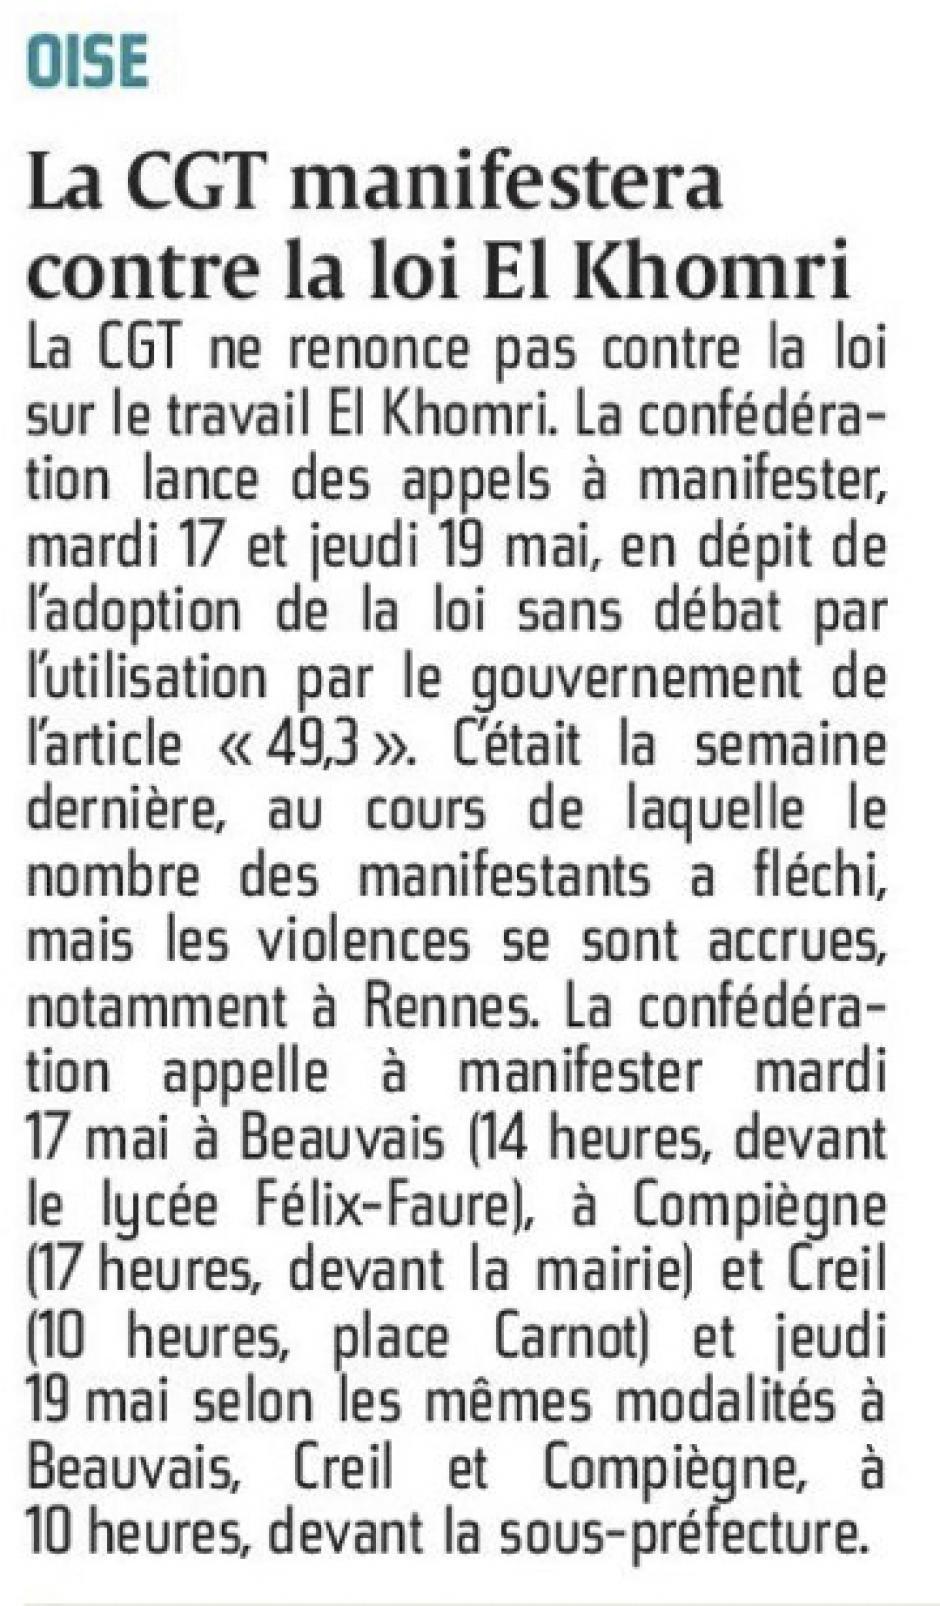 20160516-CP-Oise-La CGT manifestera contre la loi El Khomri